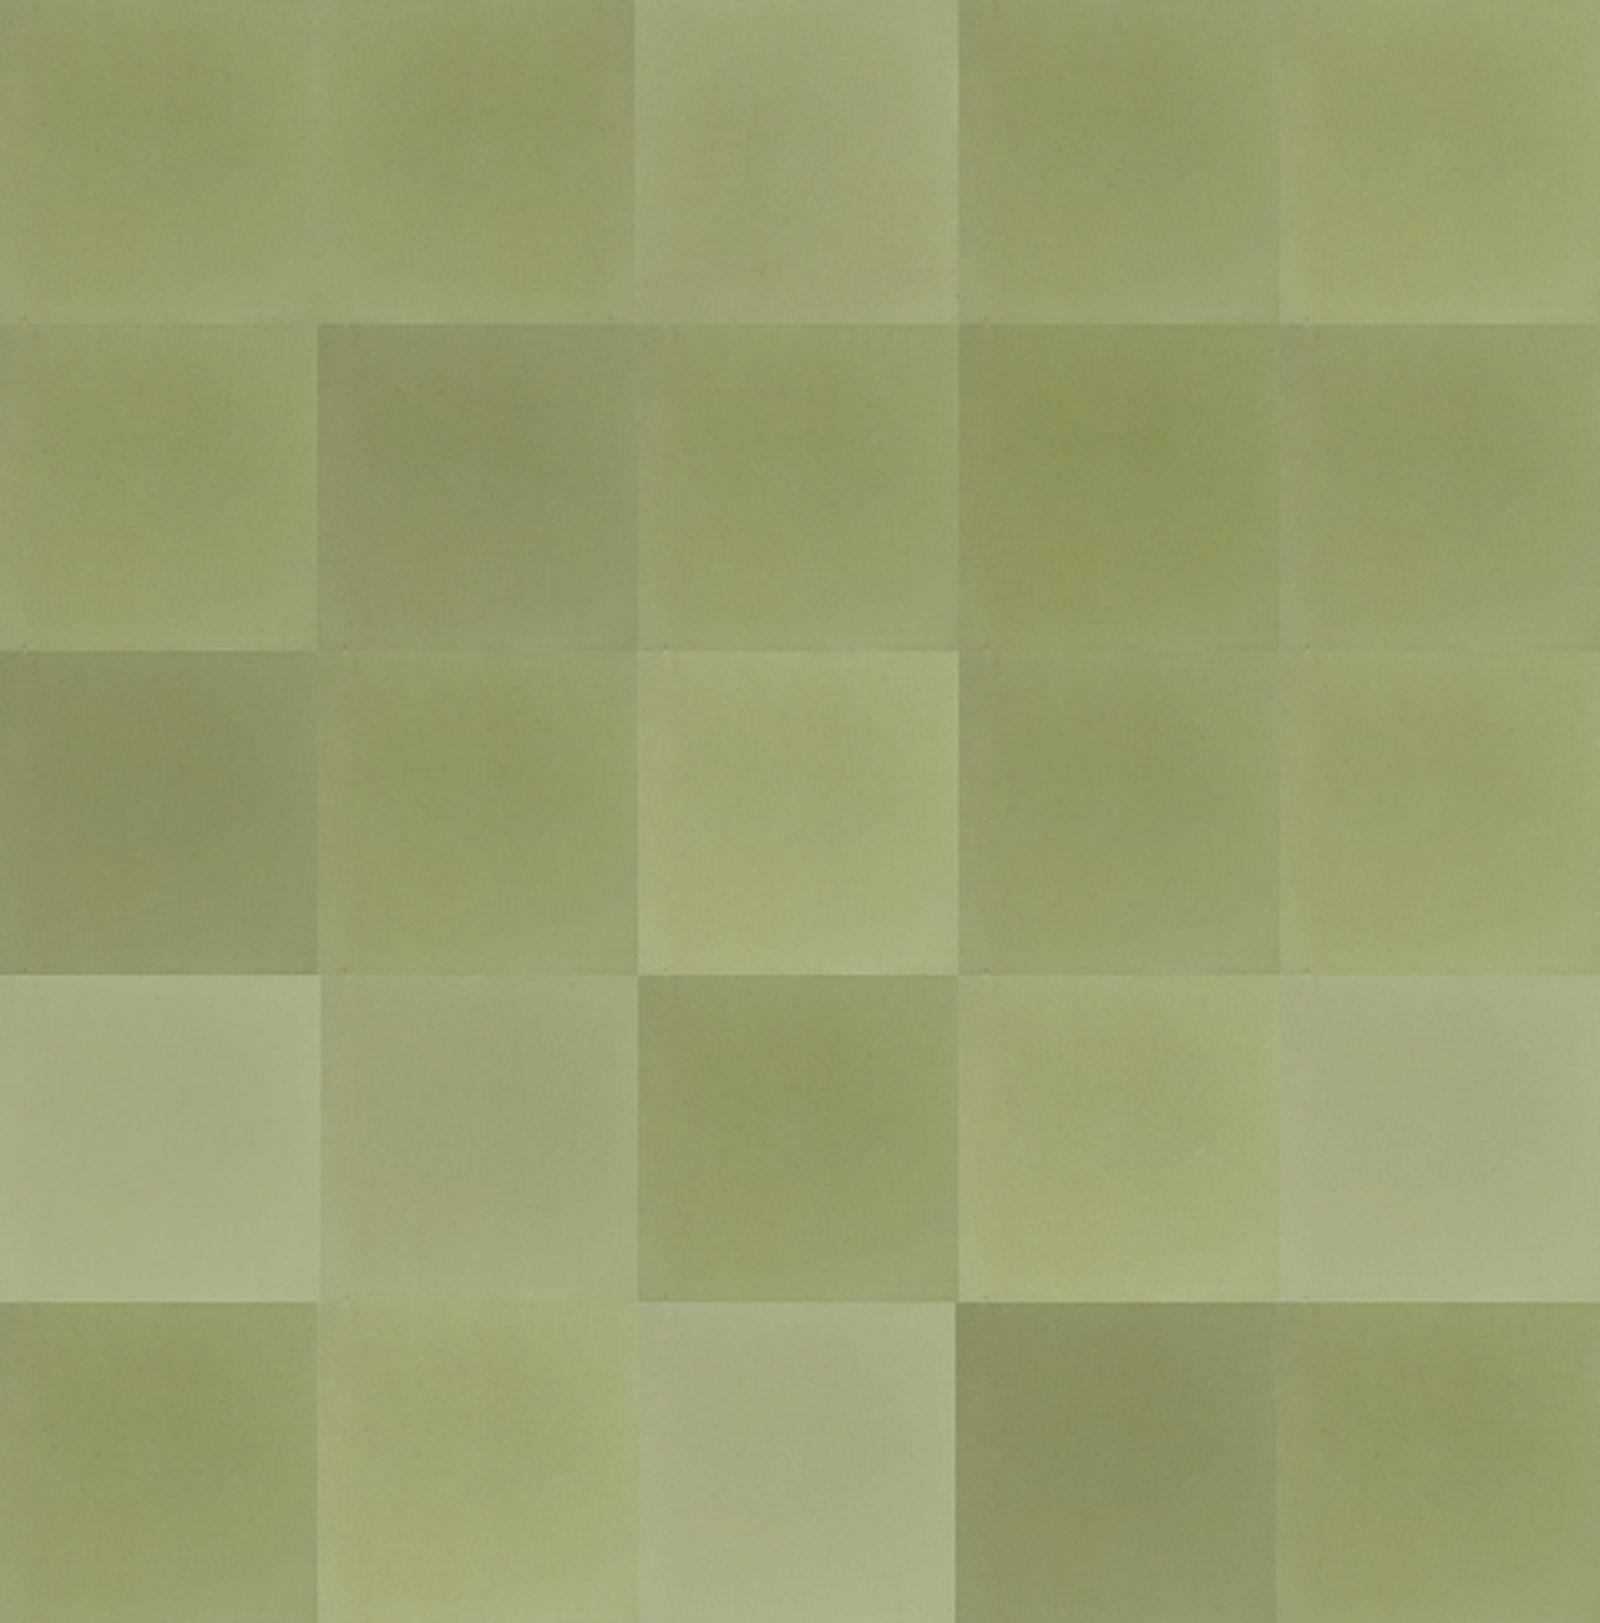 VIA_21_verlegt-viaplatten | 021